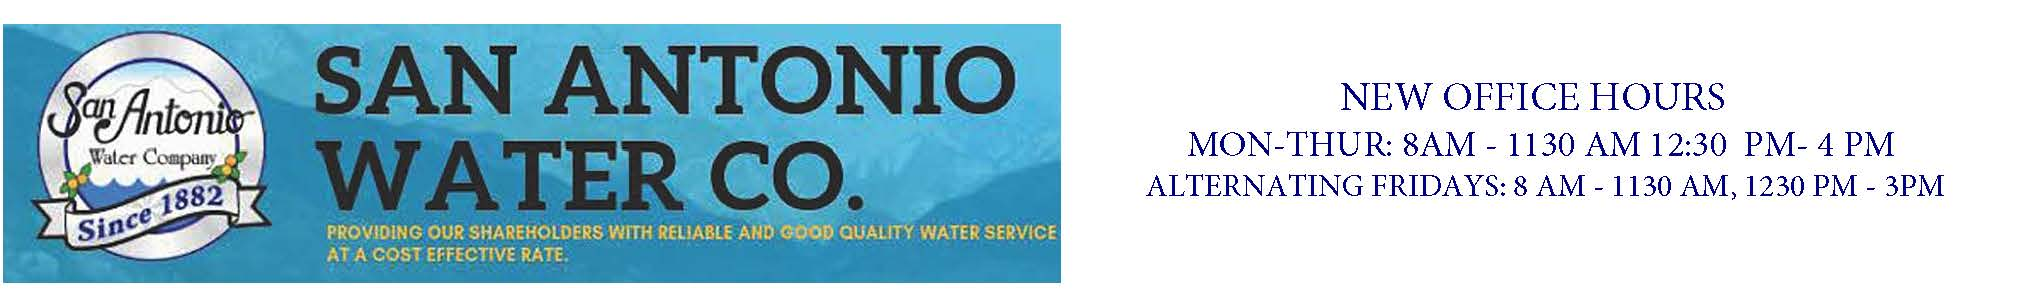 San Antonio Water Company